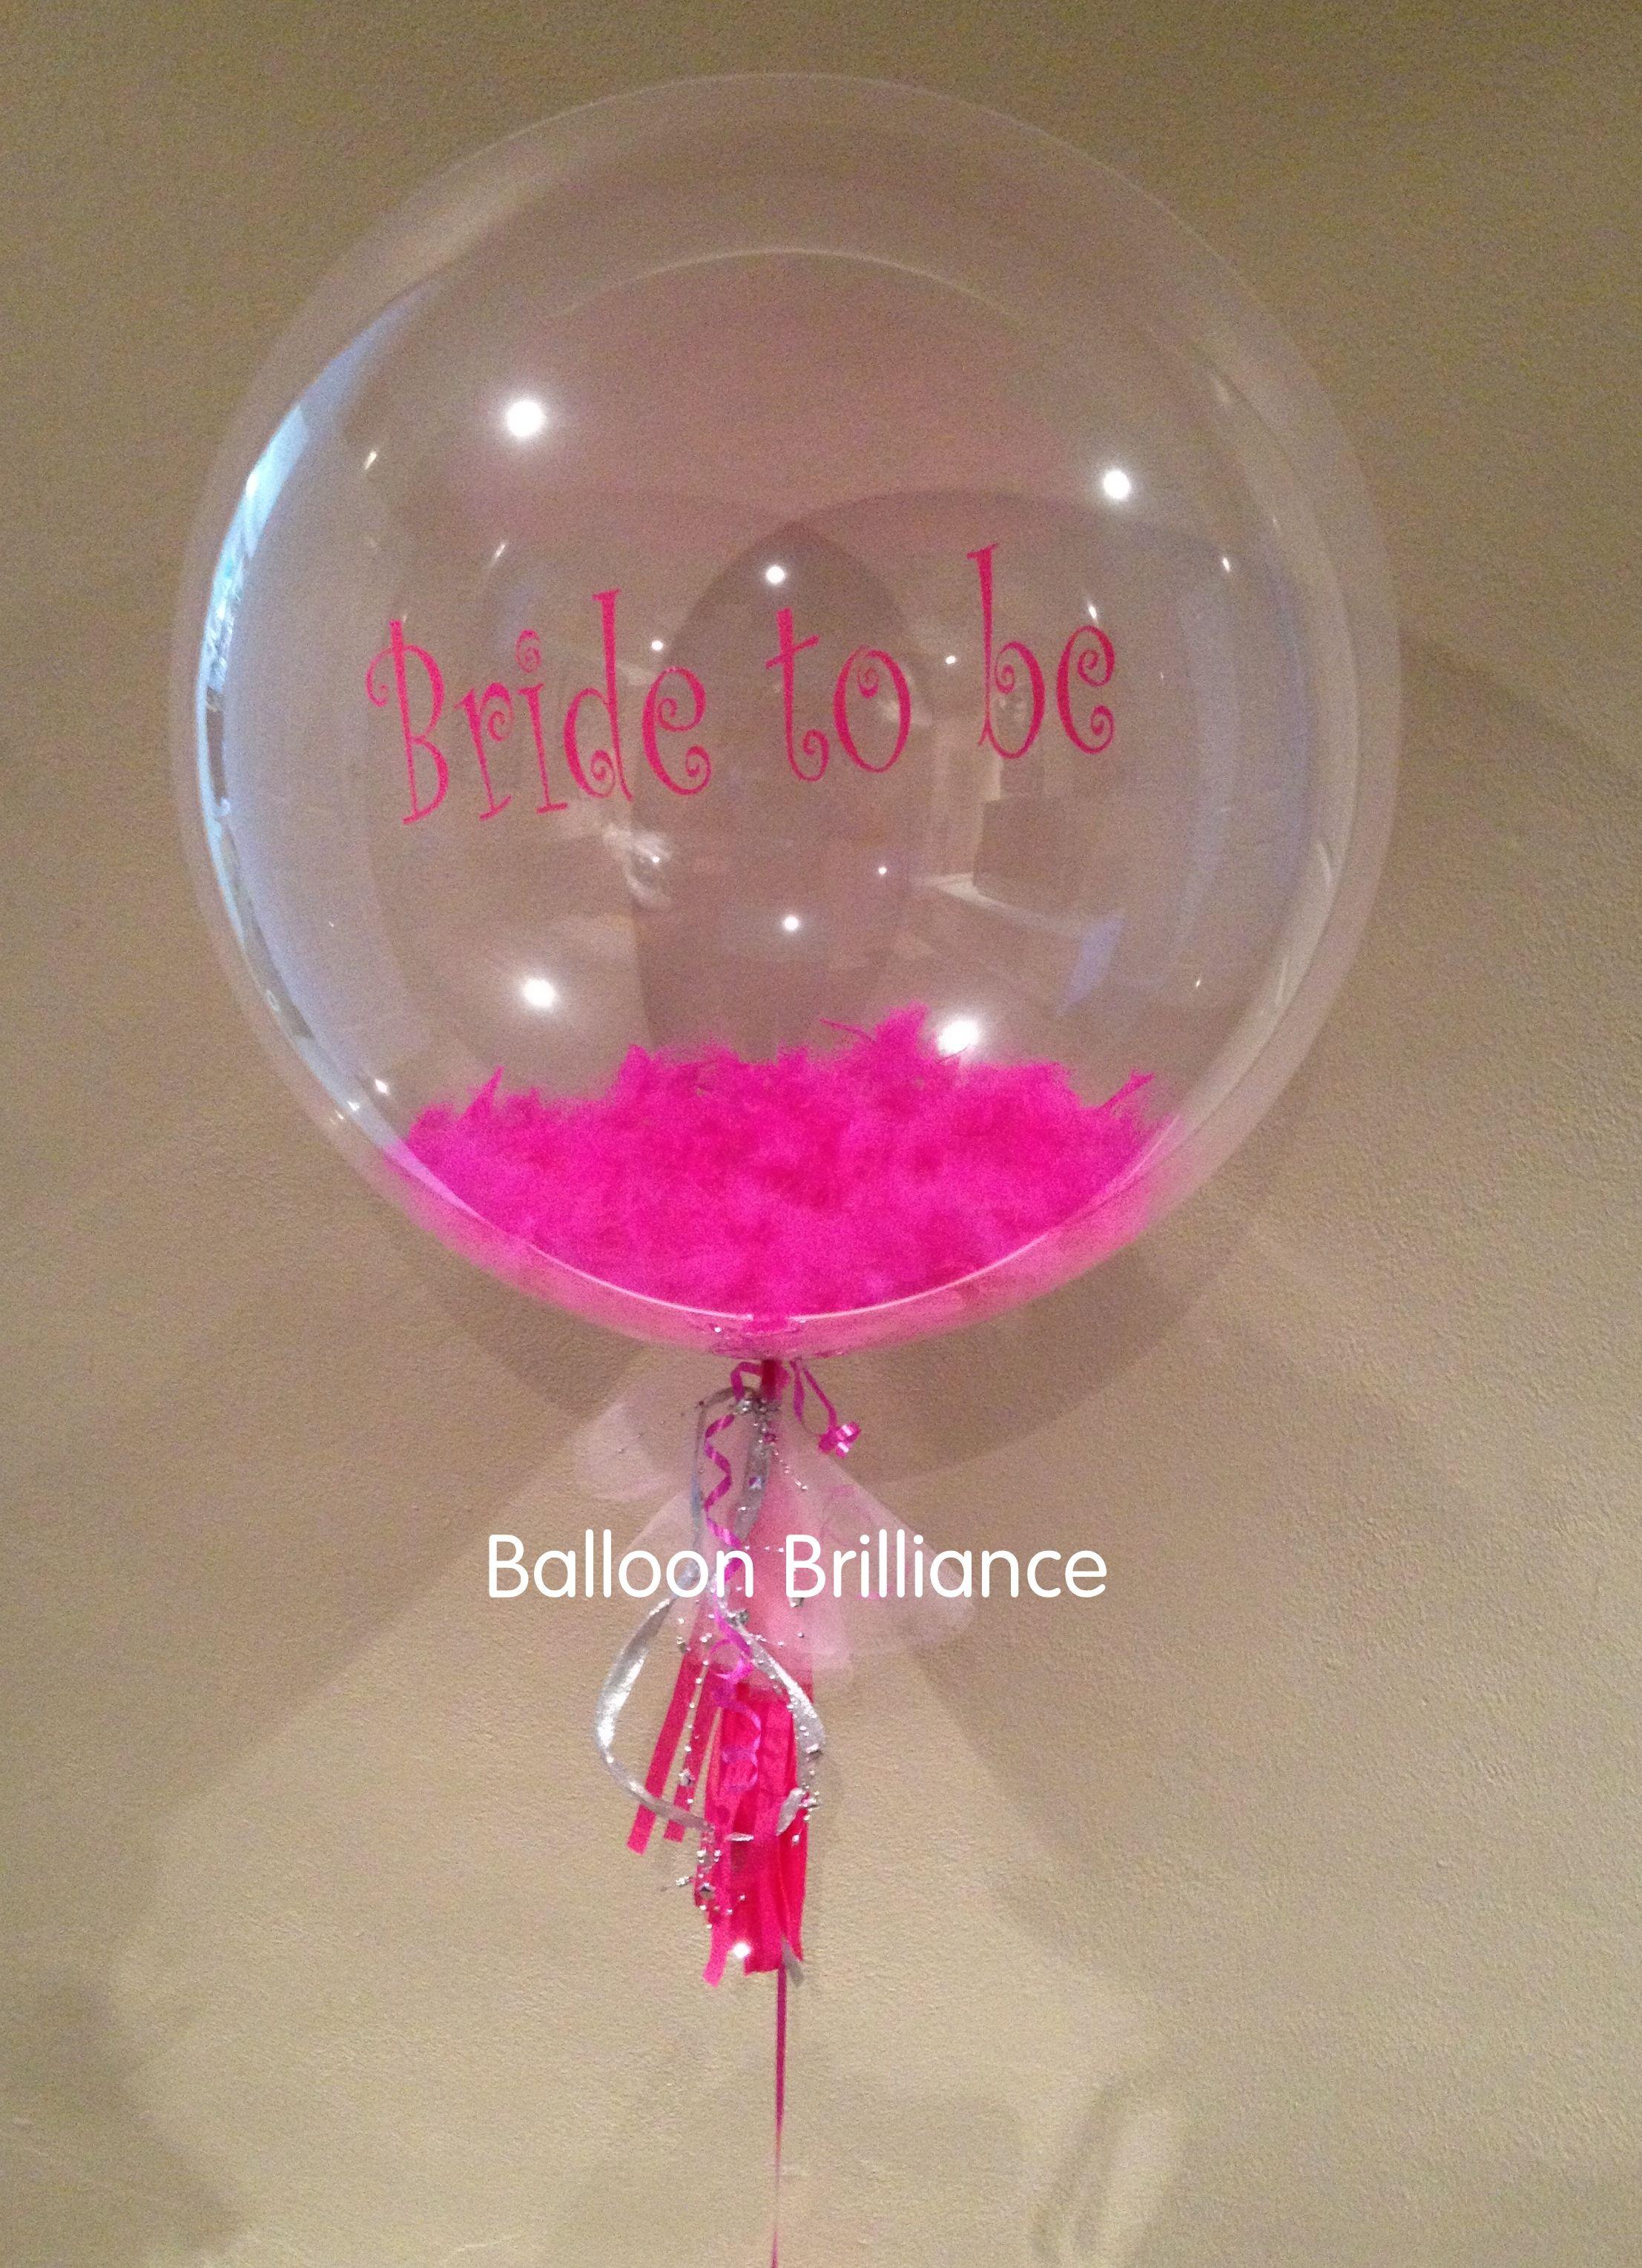 Hensnight Bridetobe Feathers Tels Personalised Balloon Balloonbrilliance